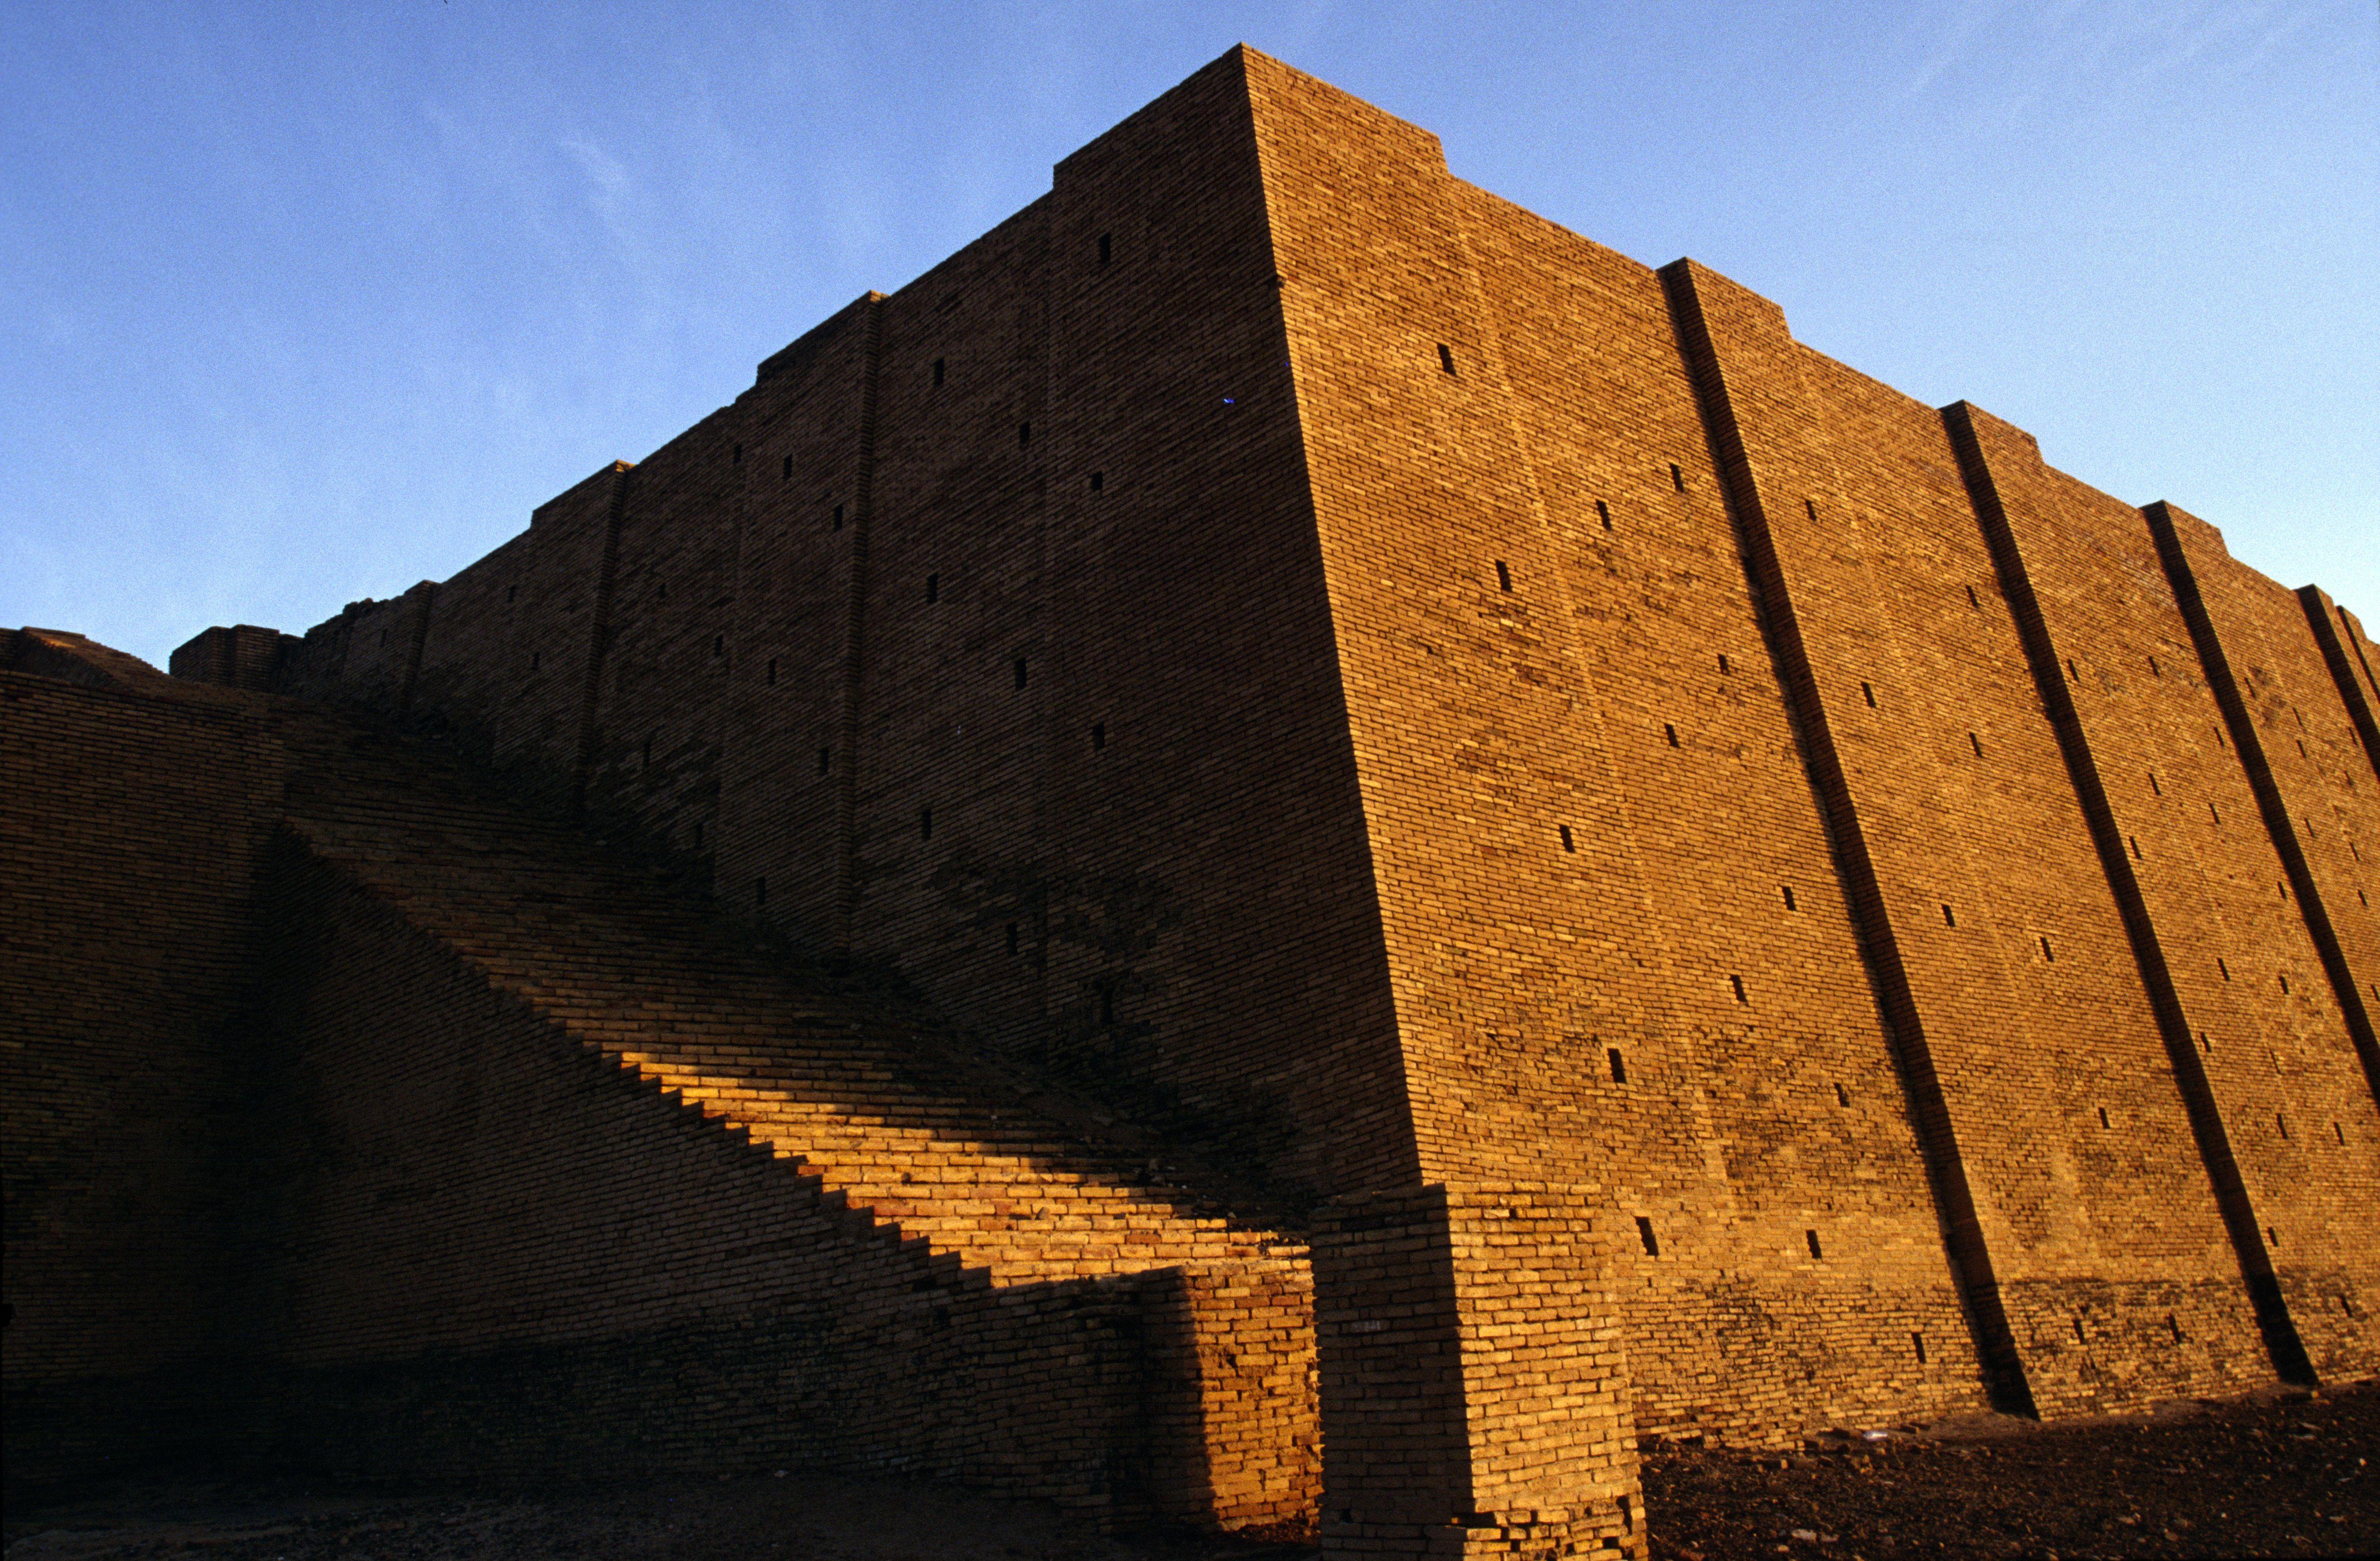 Iraq - Nasiriyah - A man walks past the Ziggurat at Ur